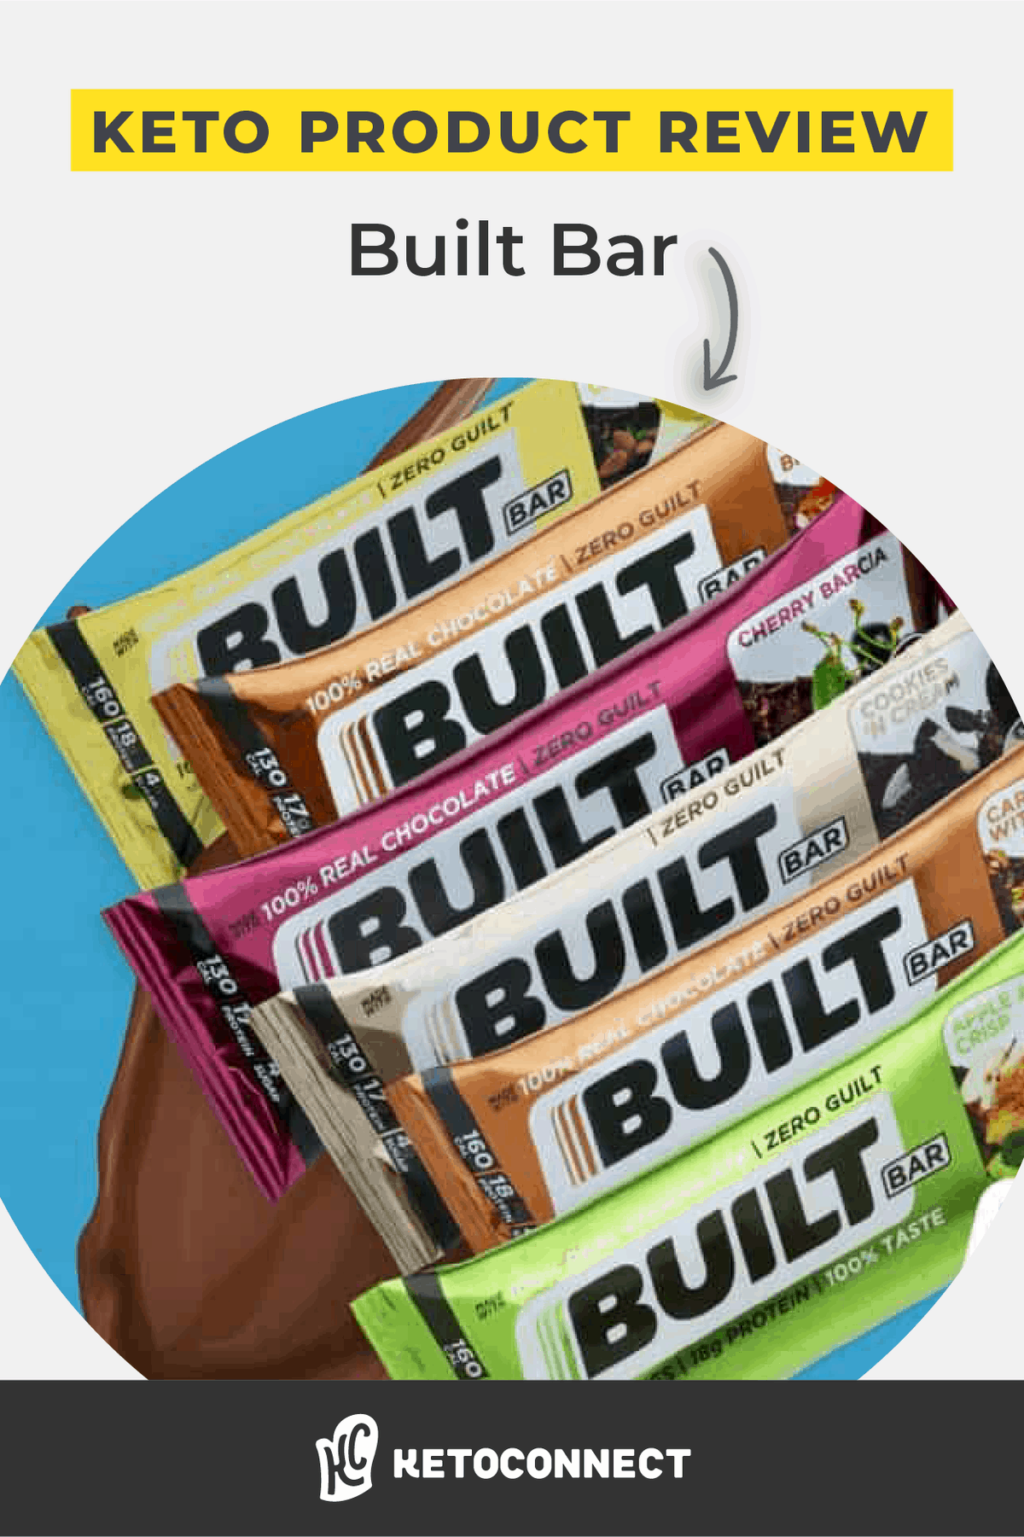 KETO PRODUCT REVIEW Built Bars 01 01